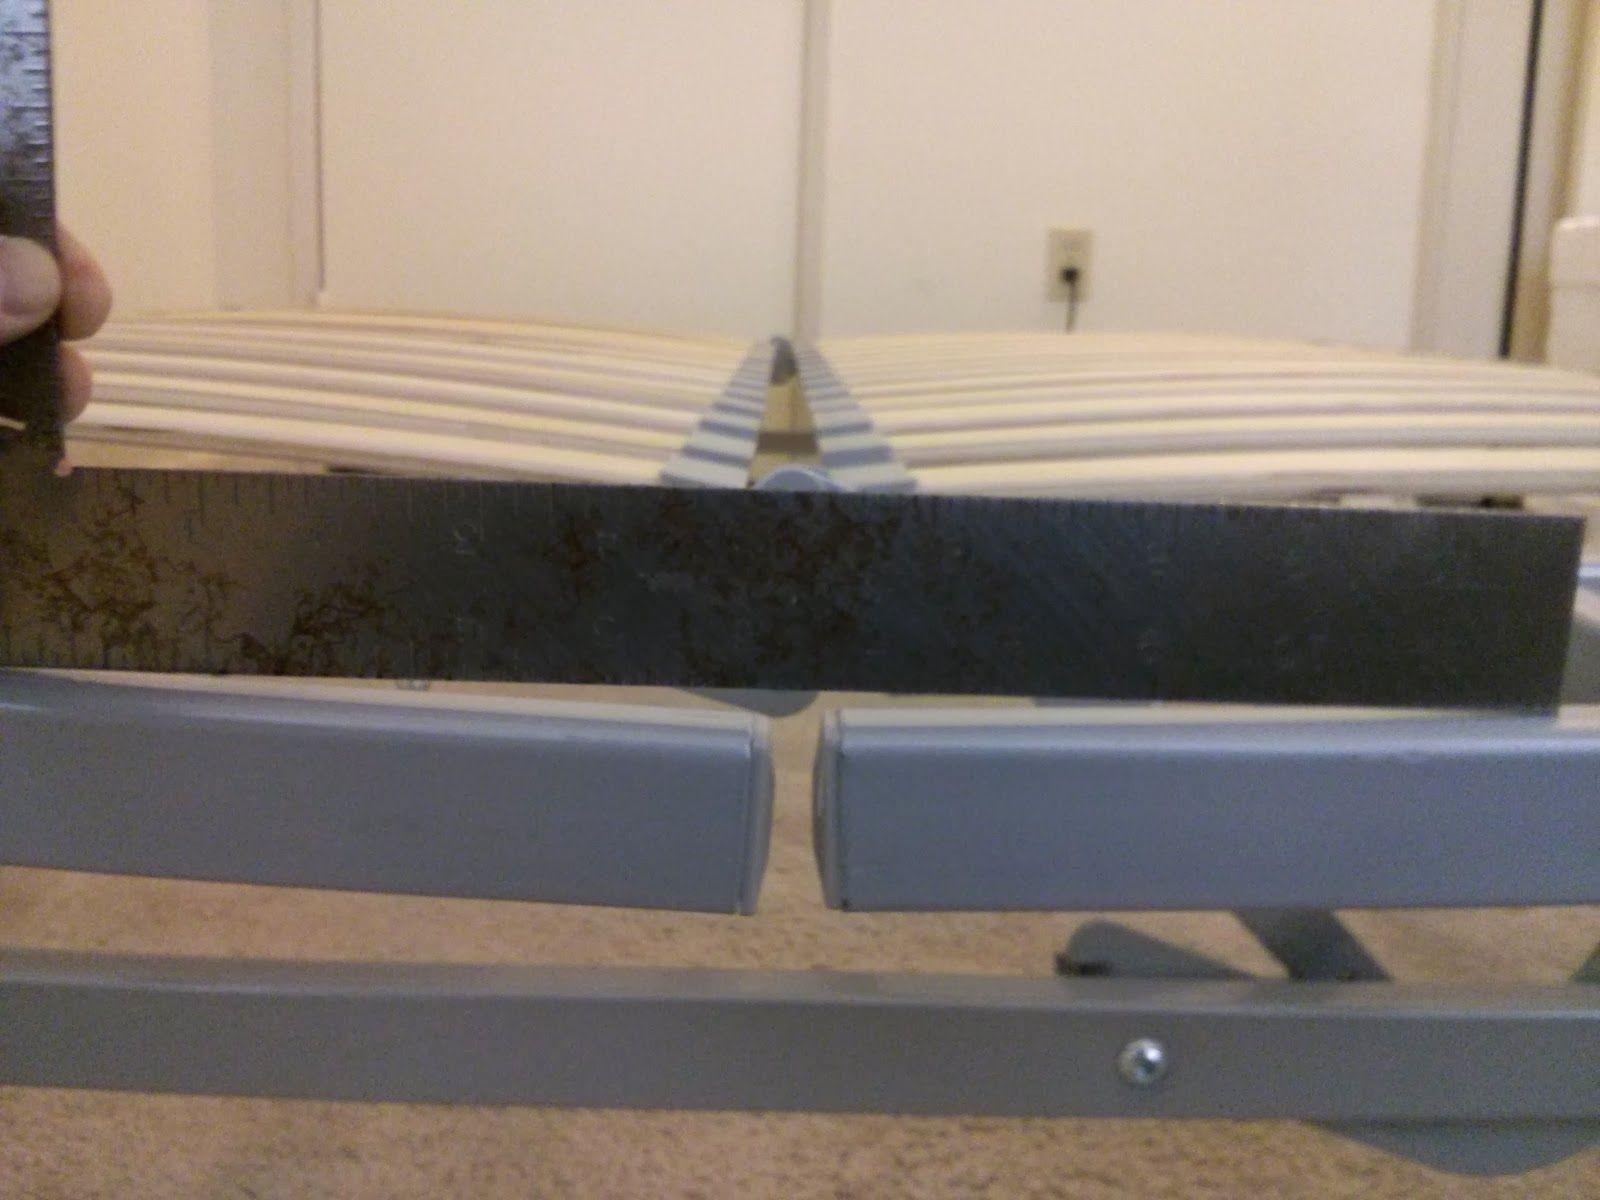 How To Make An Ikea Beddinge Lay Flat Beddinge Wohnung